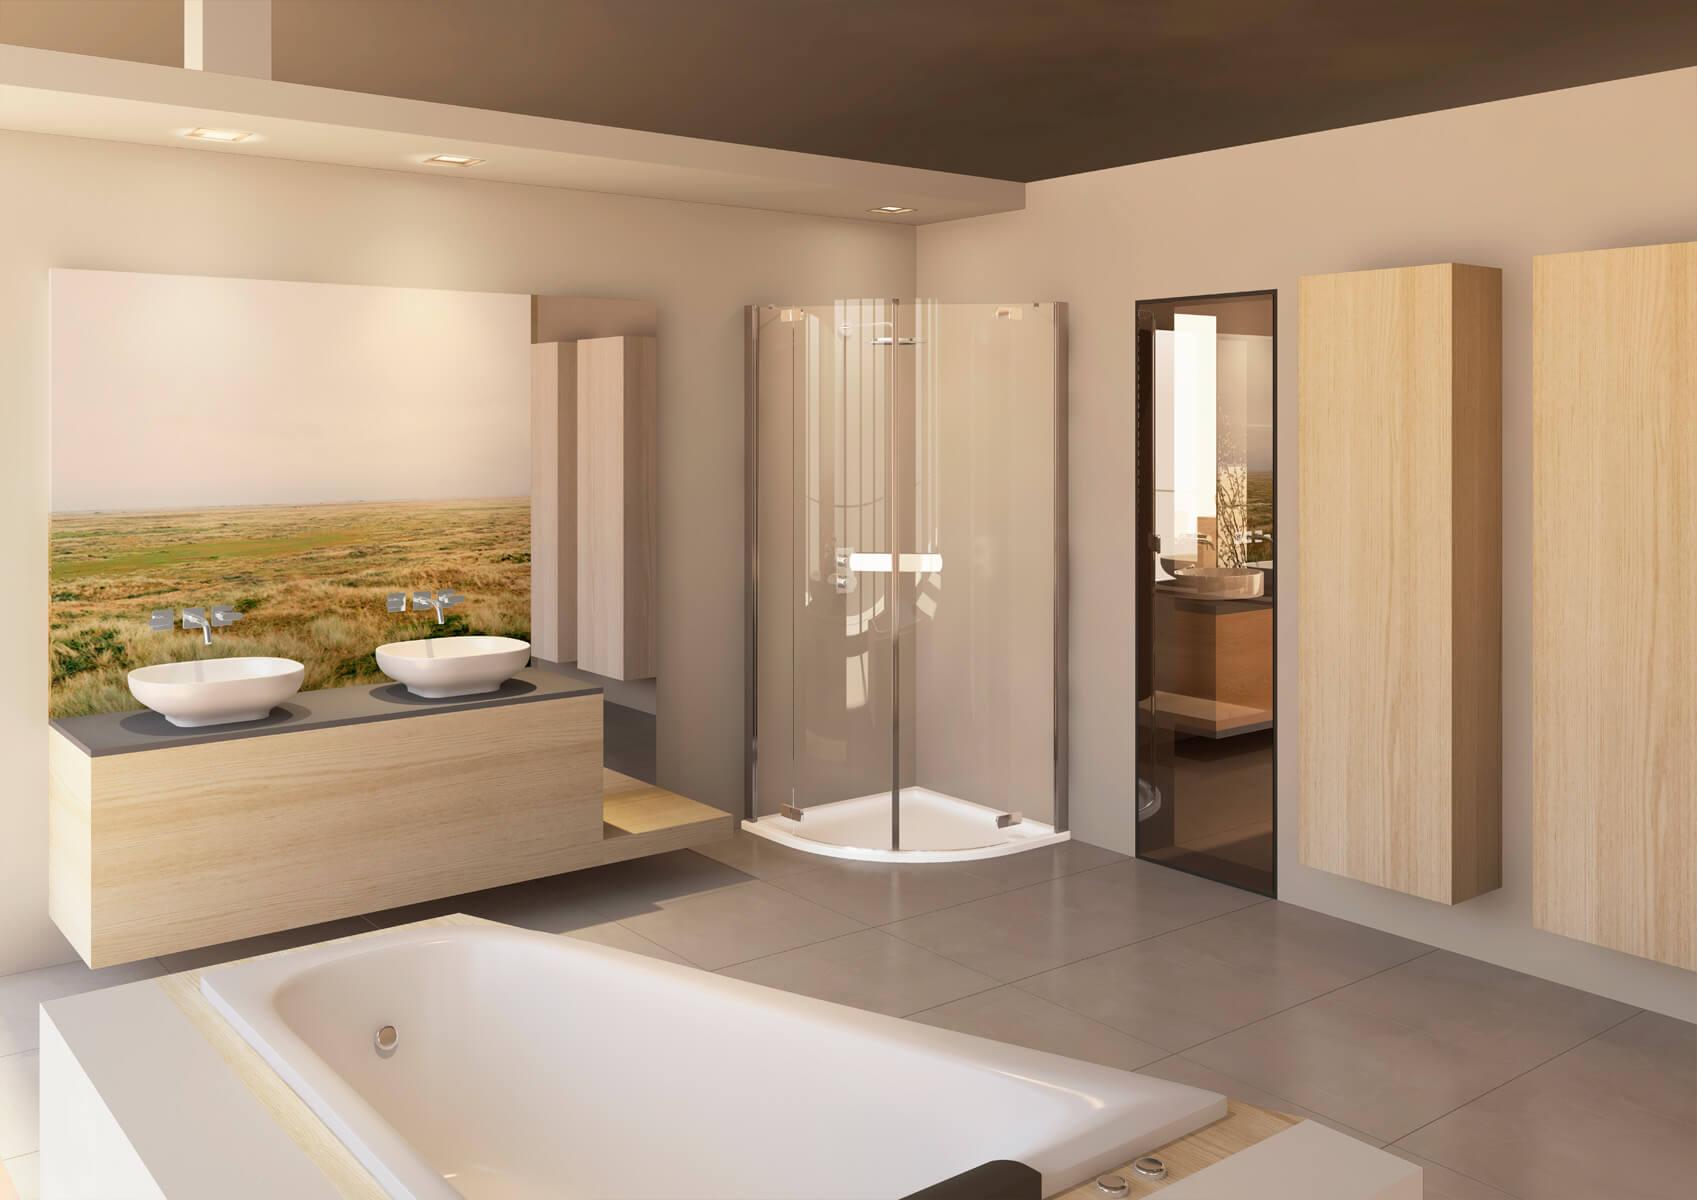 Badezimmer - Showroom | Visualisierung chora blau